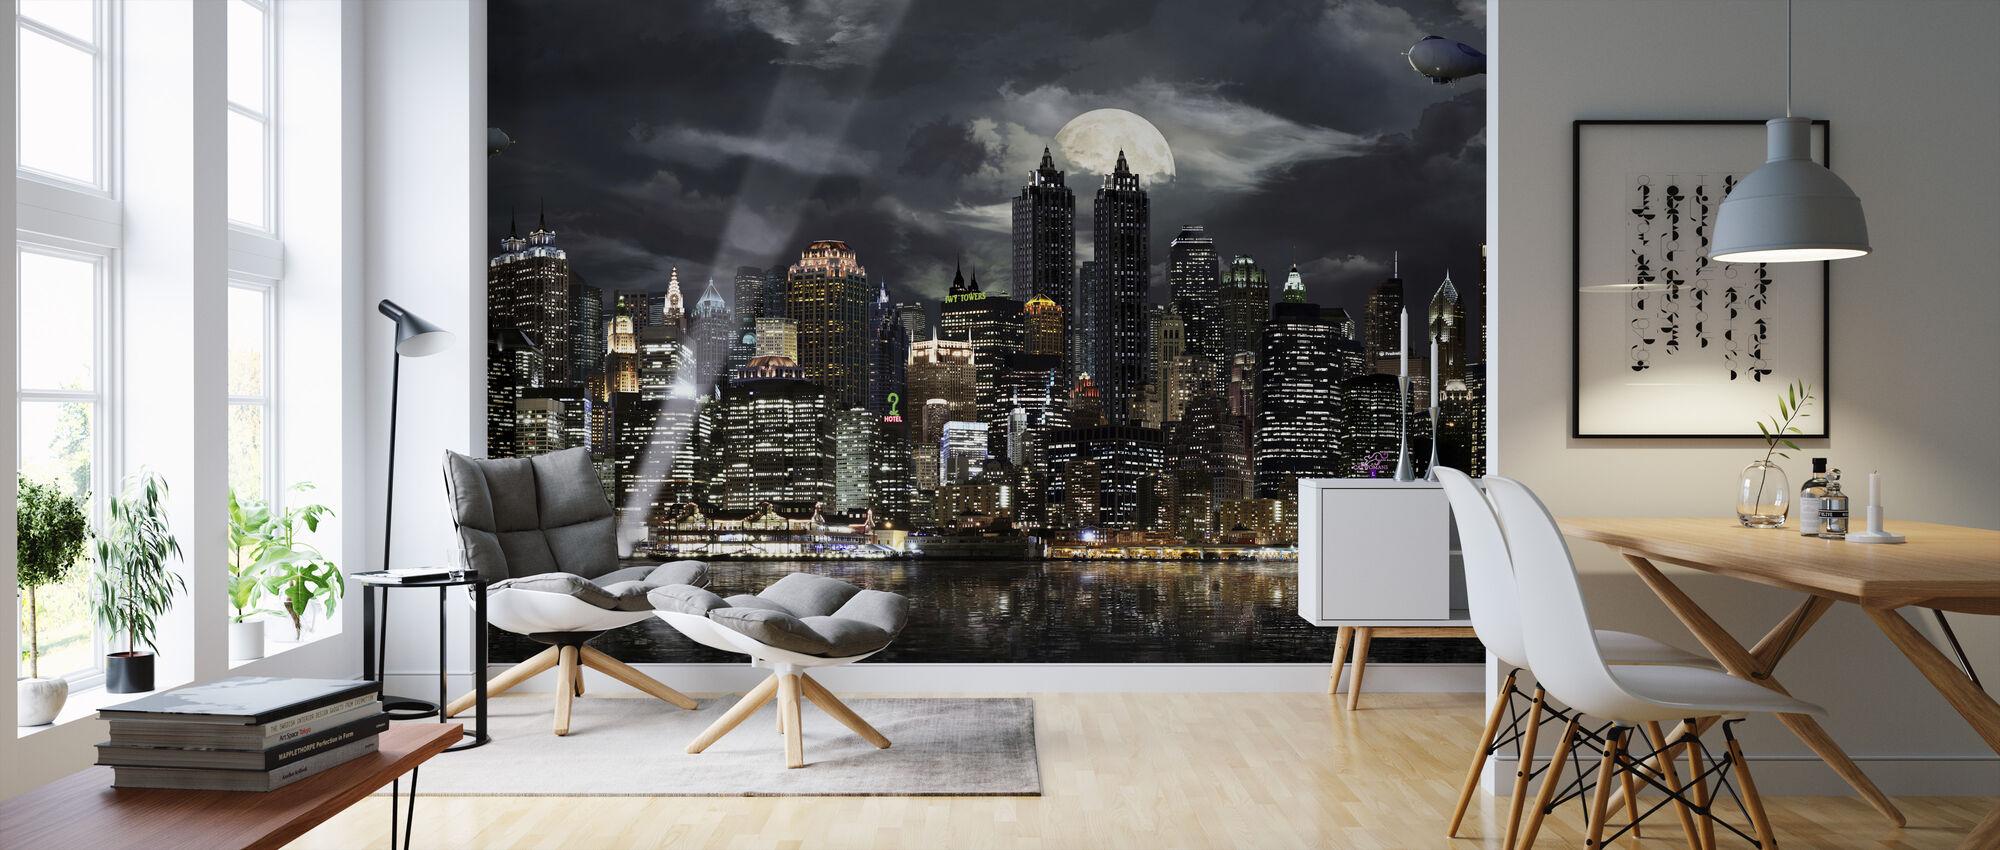 Gotham - Wallpaper - Living Room